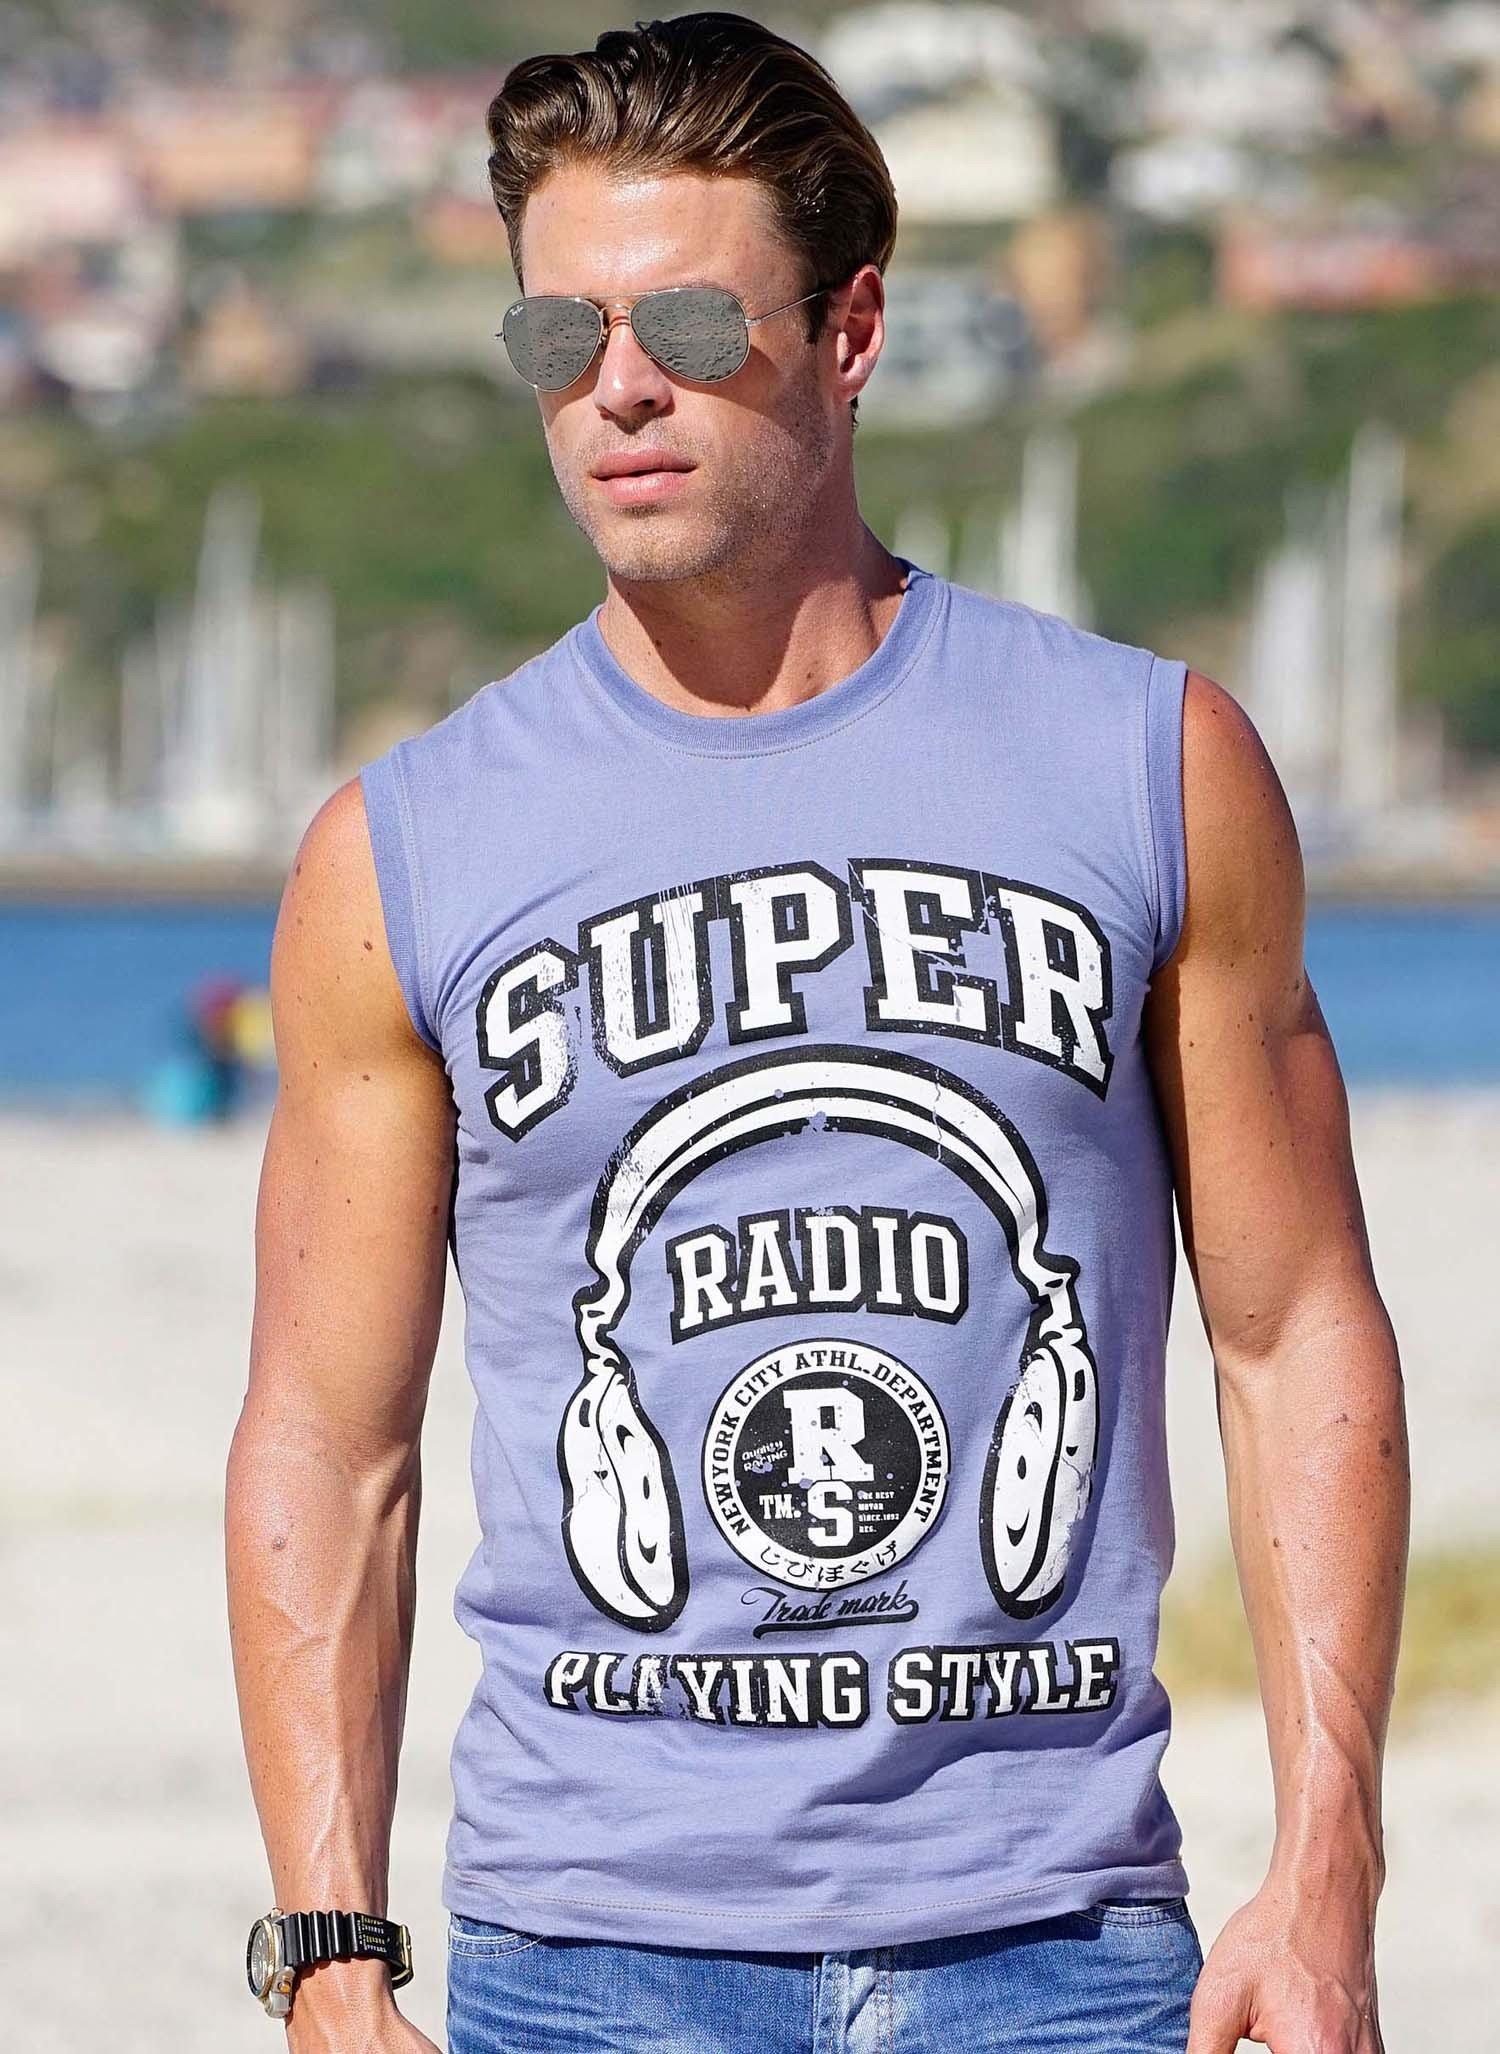 H-Muskel-Shirt,RADIO ciel L 051 - 1 - Ronja.ch